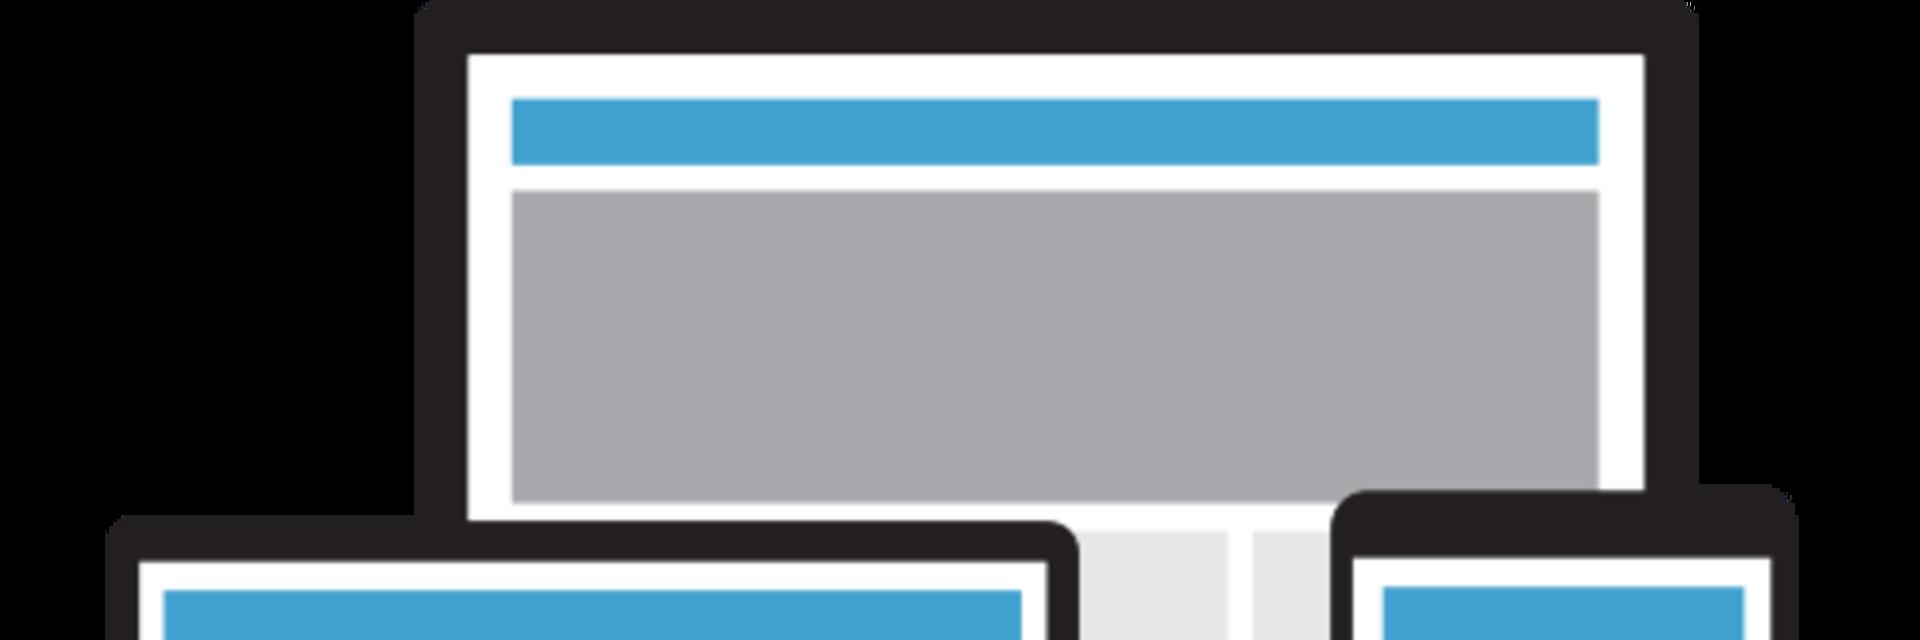 hero-background-image-header